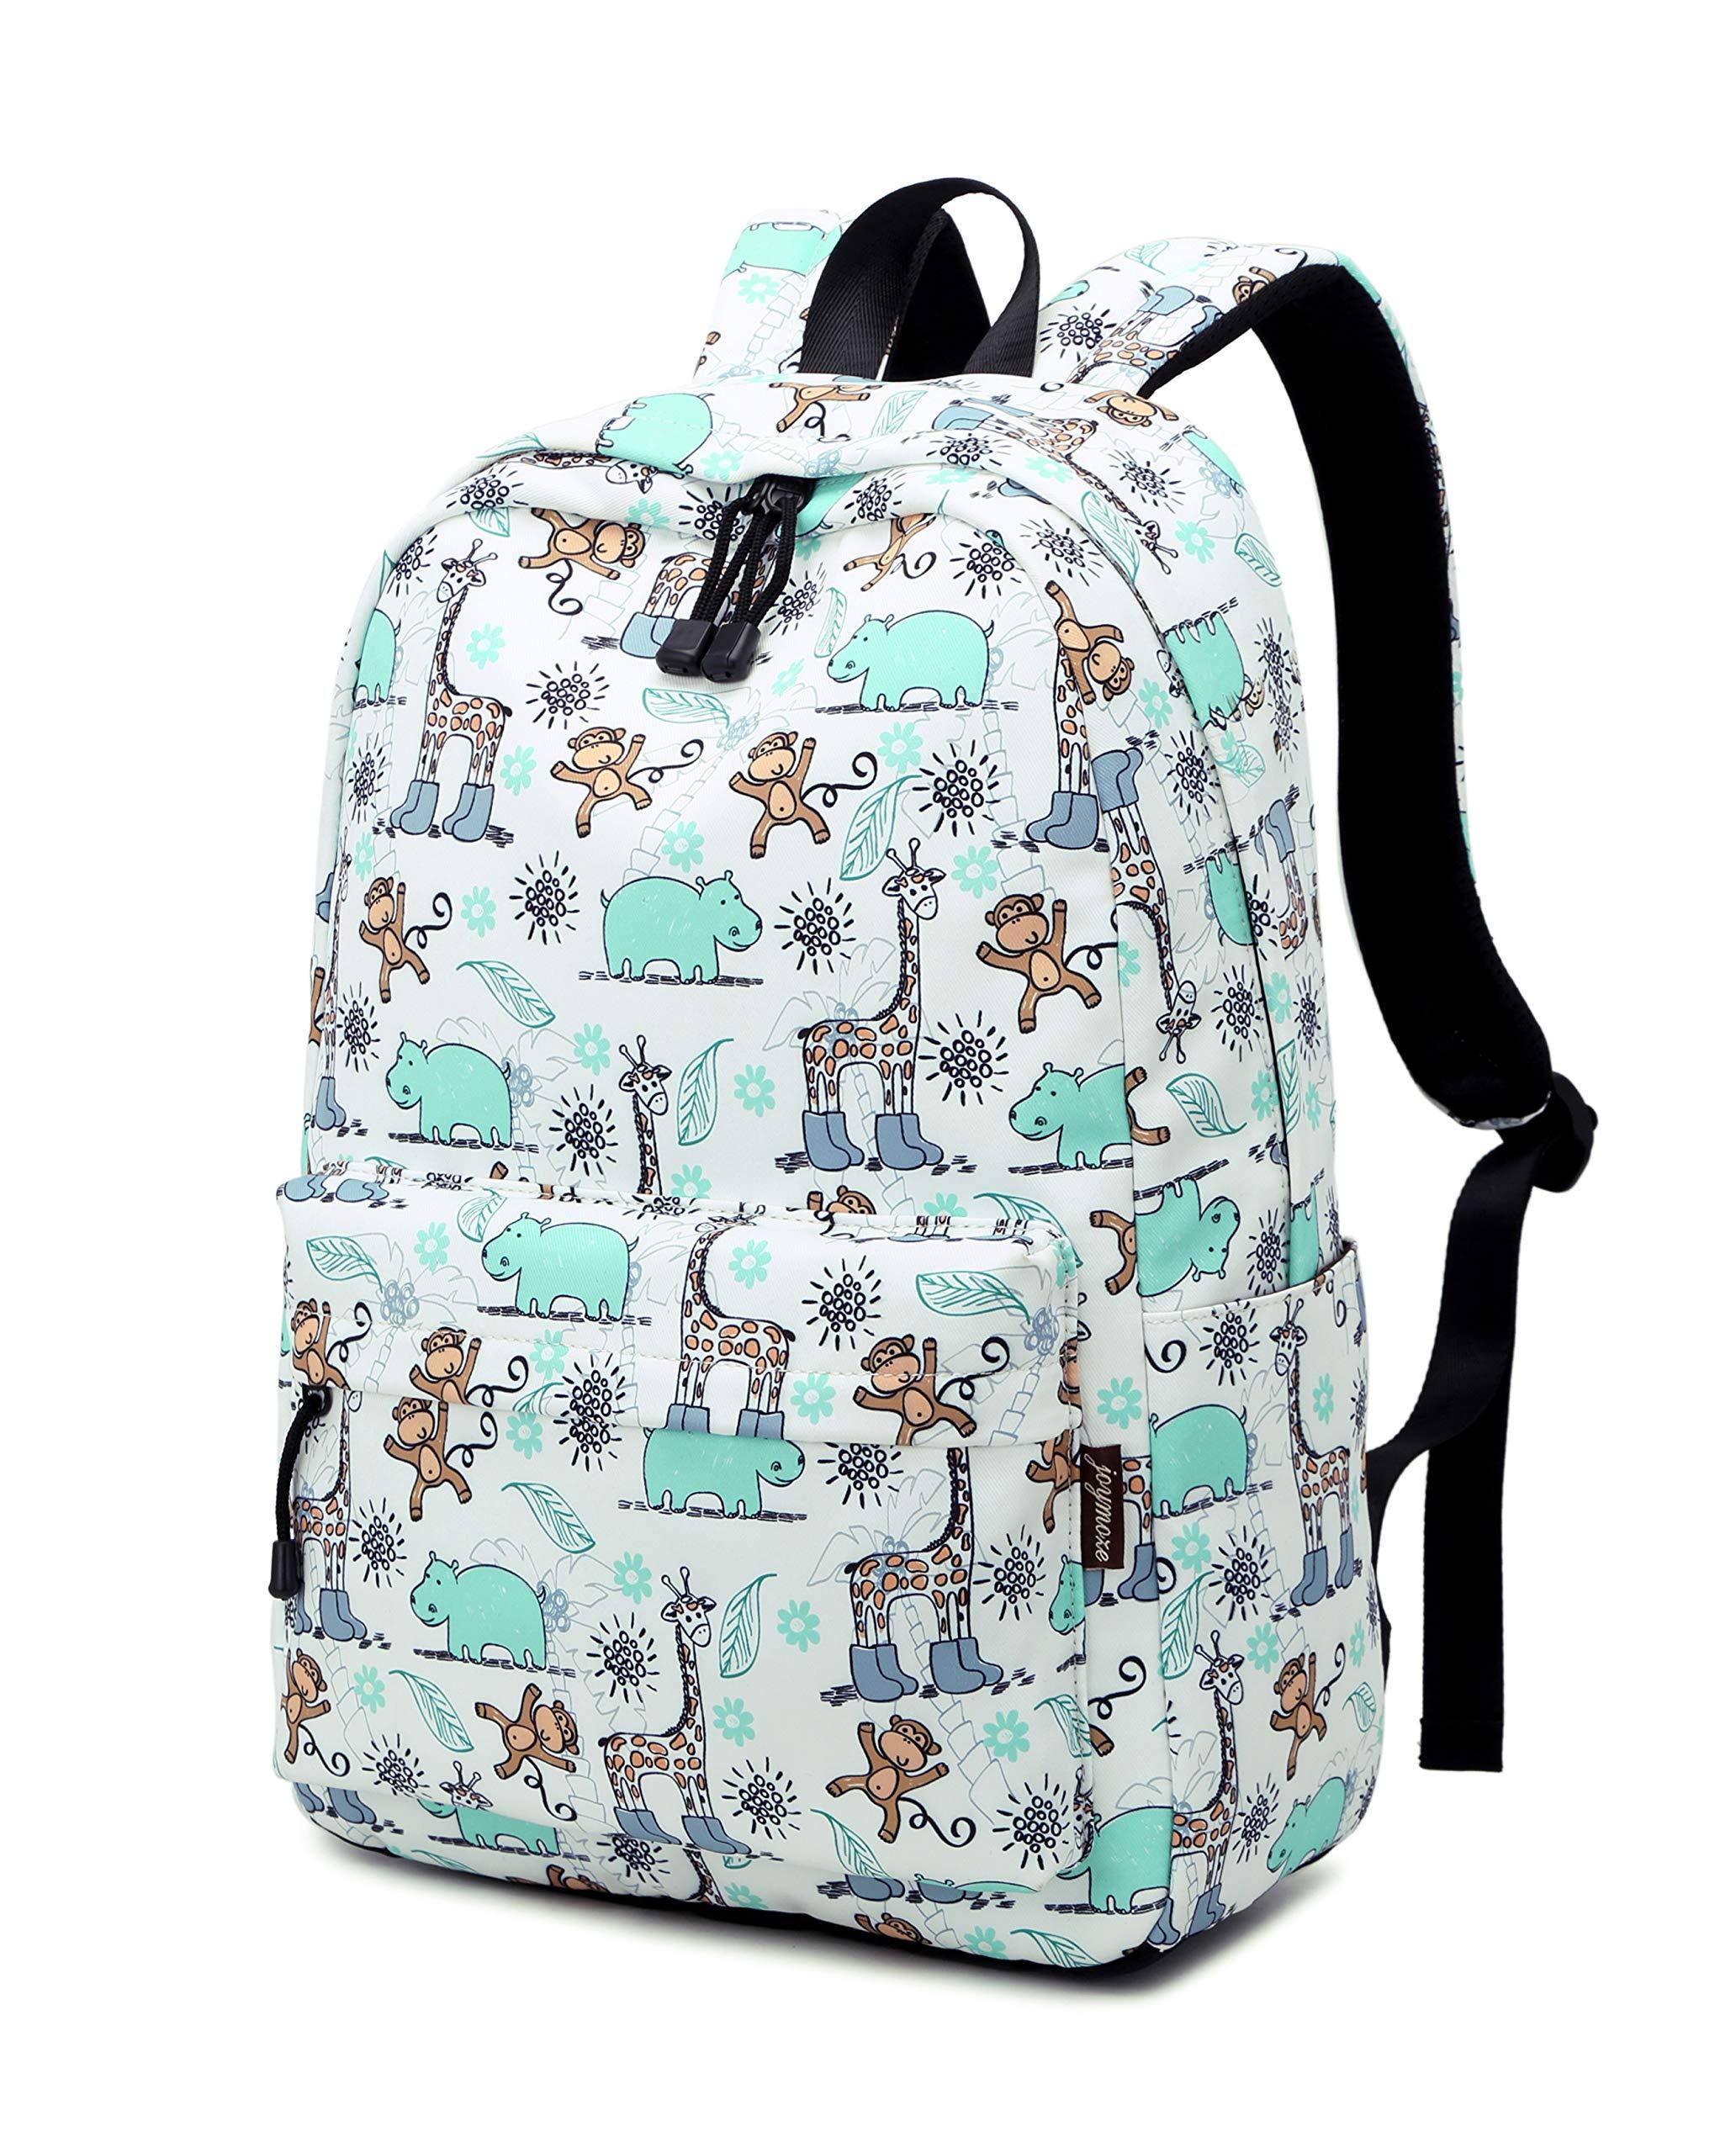 91T0WKIJdPL - Joymoze Mochila Infantil para Niño y Niña - Mochila Escolar Ligera para Adolescentes Animal